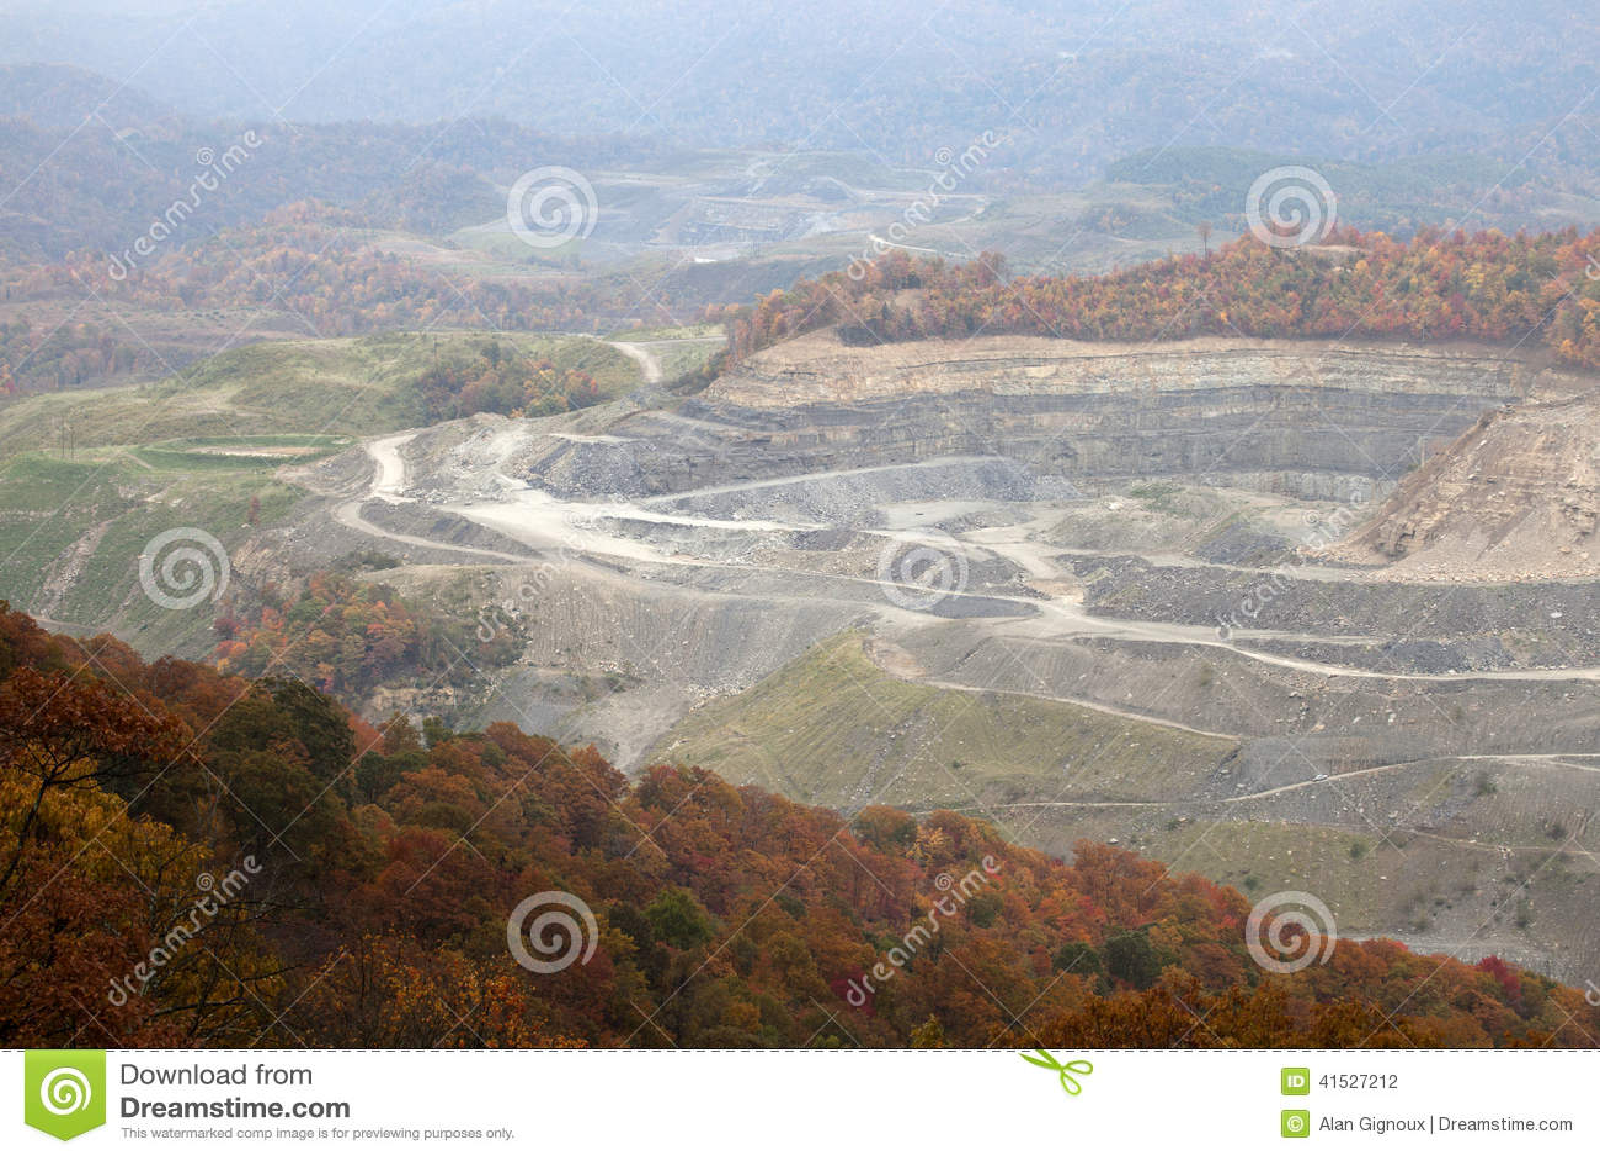 Угольная шахта, Appalachia, Америка